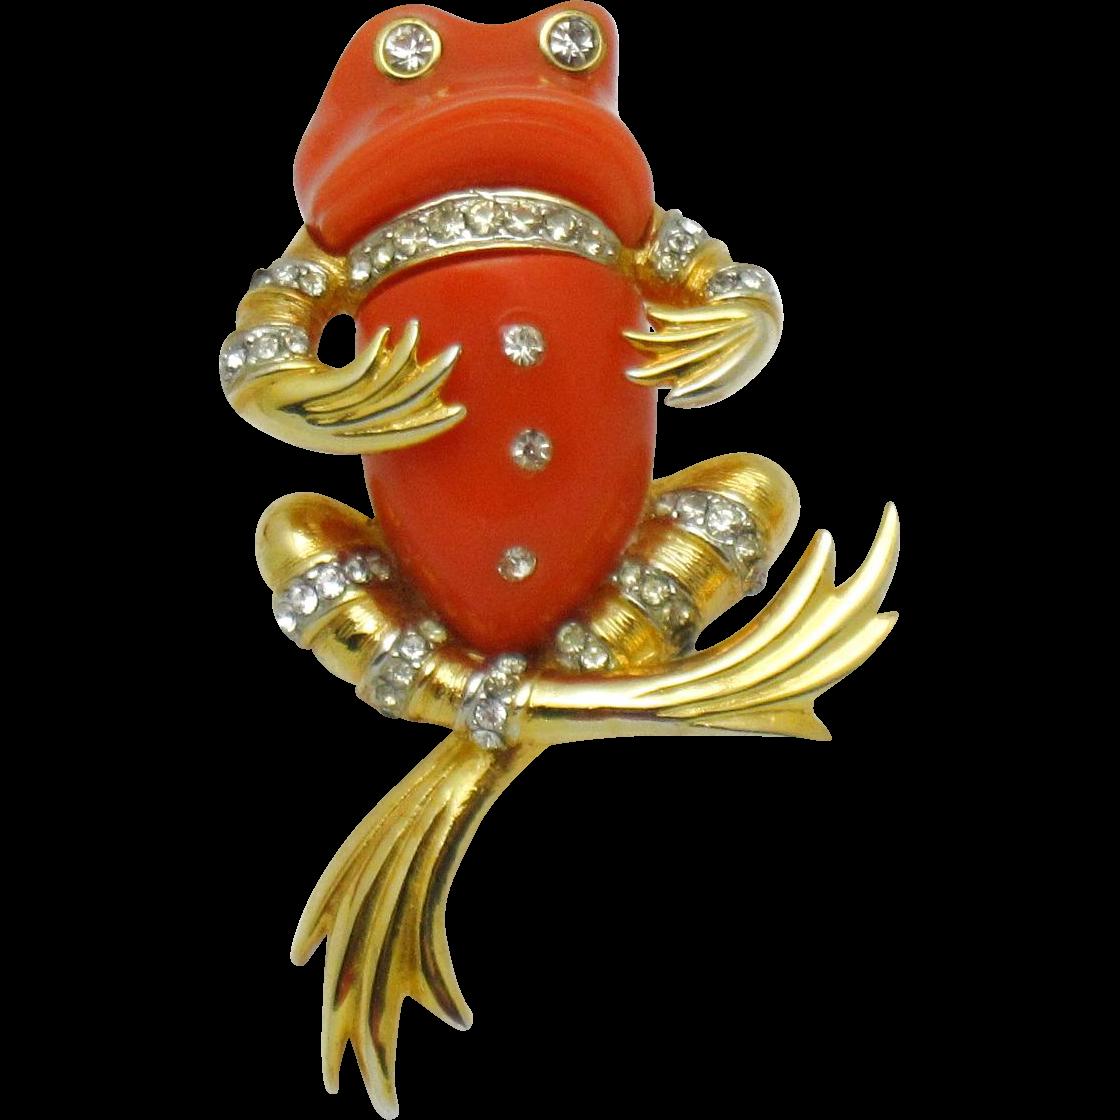 Boucher Black Flower Rose Pin Brooch Signed Numbered: BOUCHER 1968 Lucite Rhinestone Dandy Frog Figural Brooch